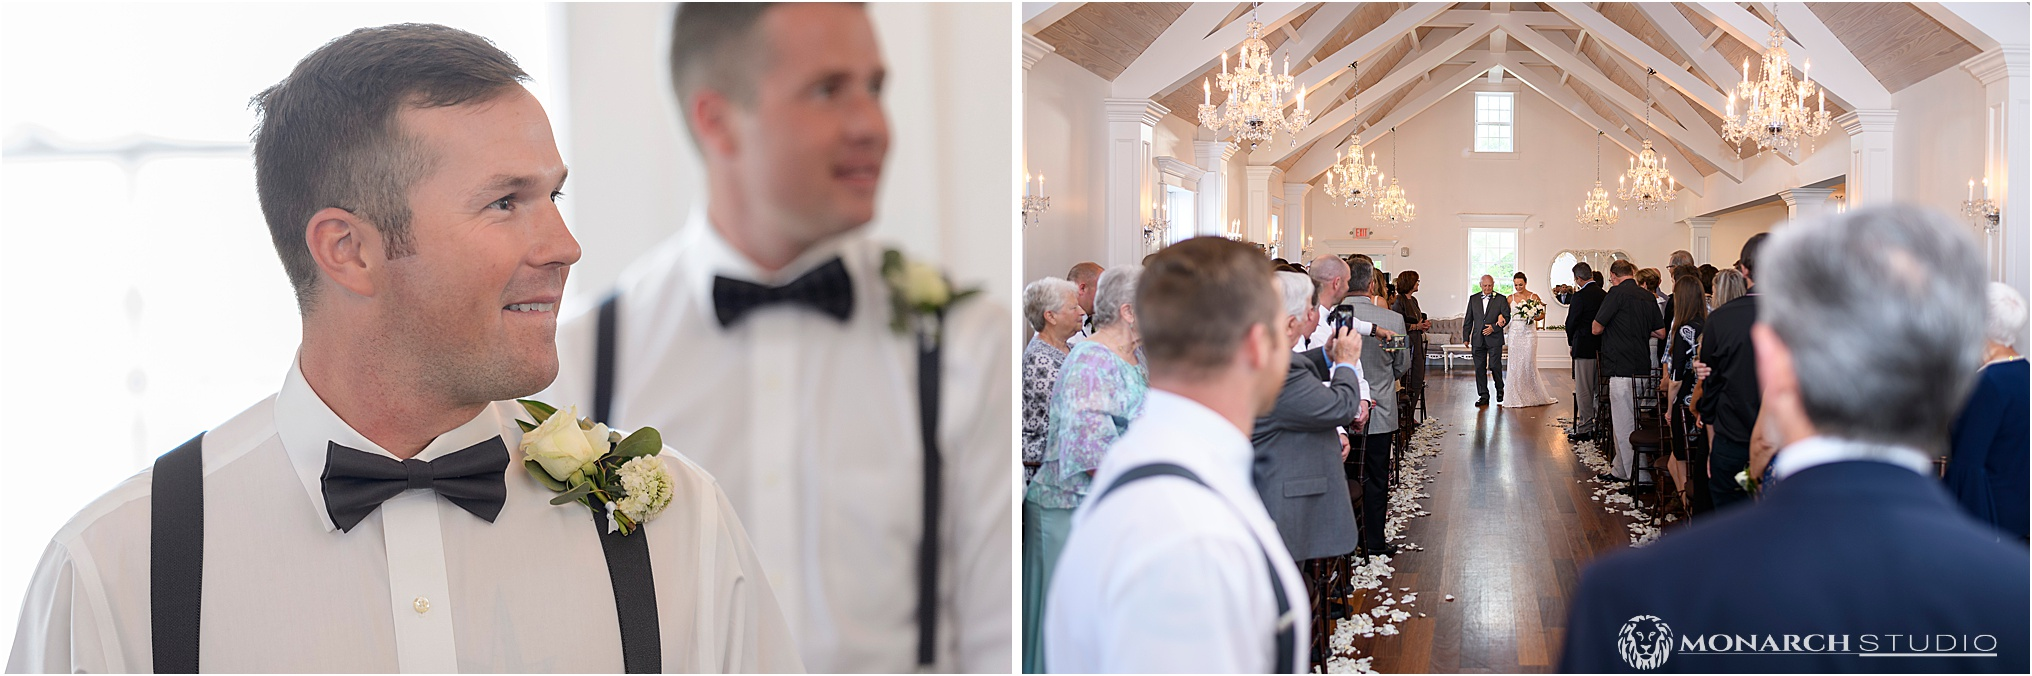 065-whiteroom-wedding-photographer-2019-05-22_0047.jpg